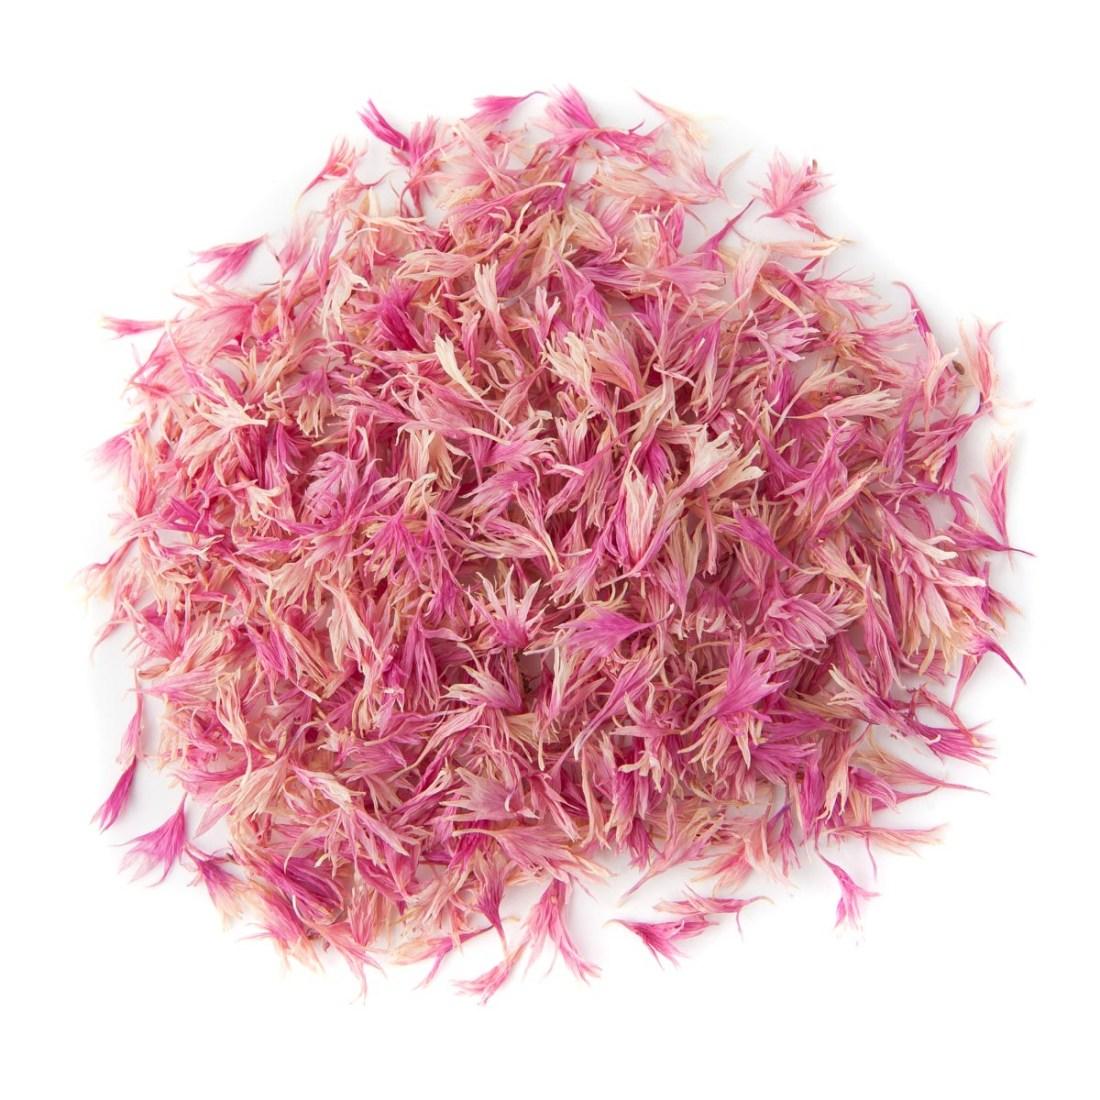 Tudor Pink Wildflower Confetti